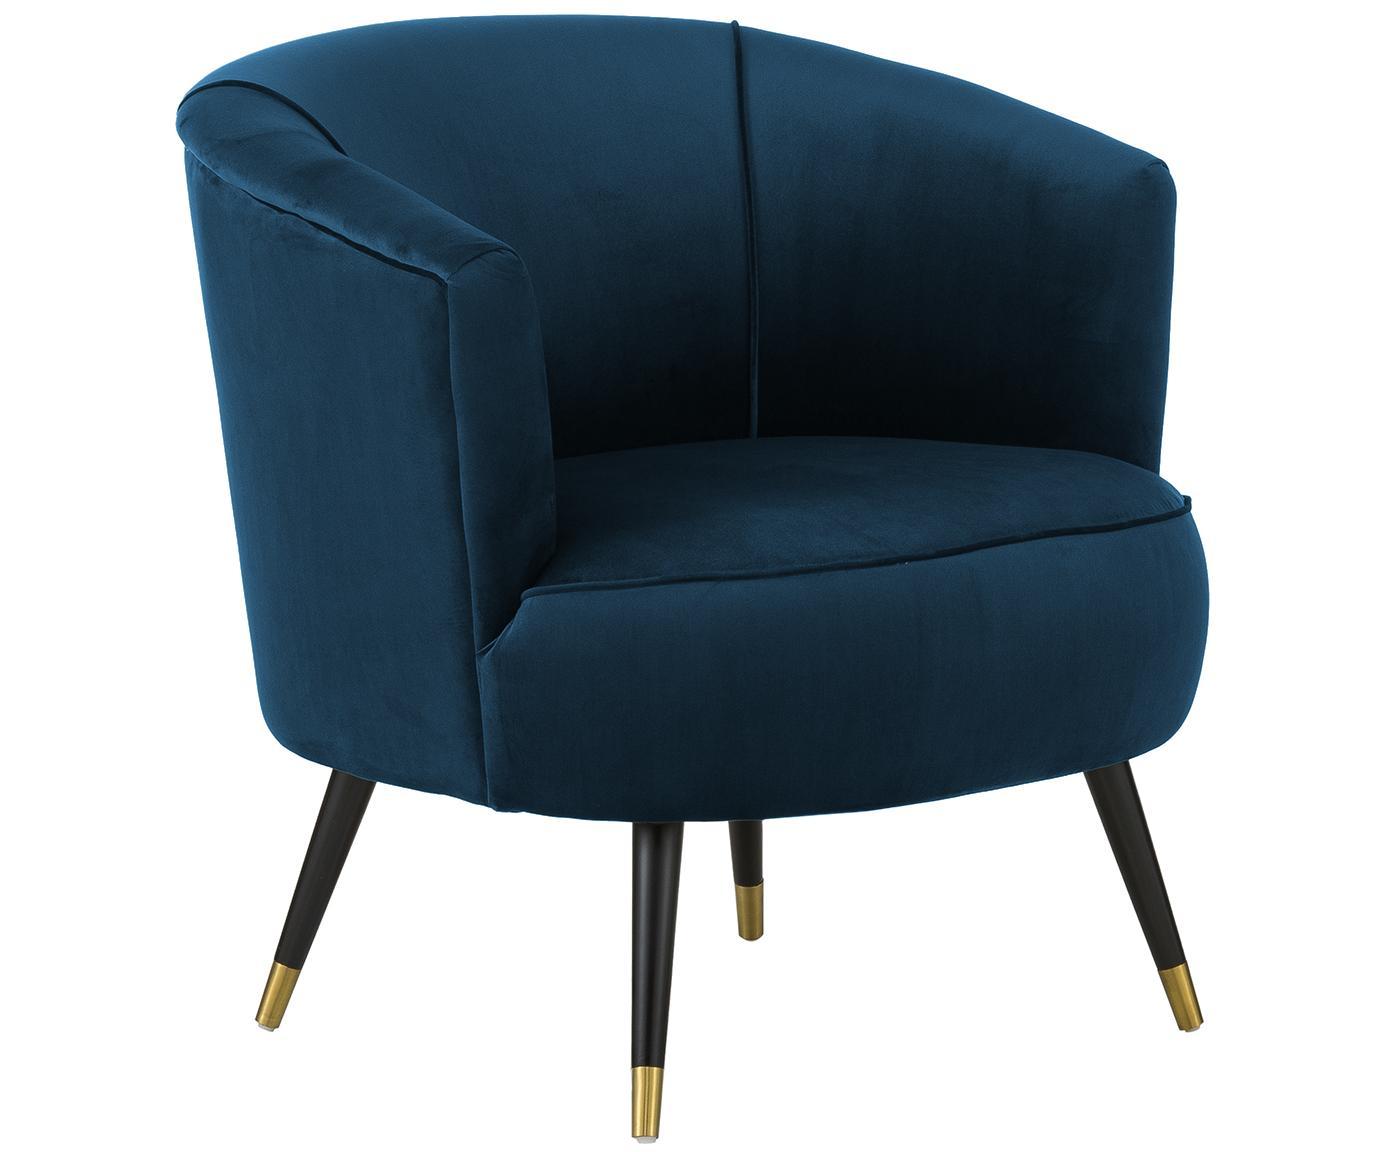 Fluwelen fauteuil Ella, Bekleding: fluweel (polyester), Poten: gelakt metaal, Donkerblauw, B 74 x D 78 cm